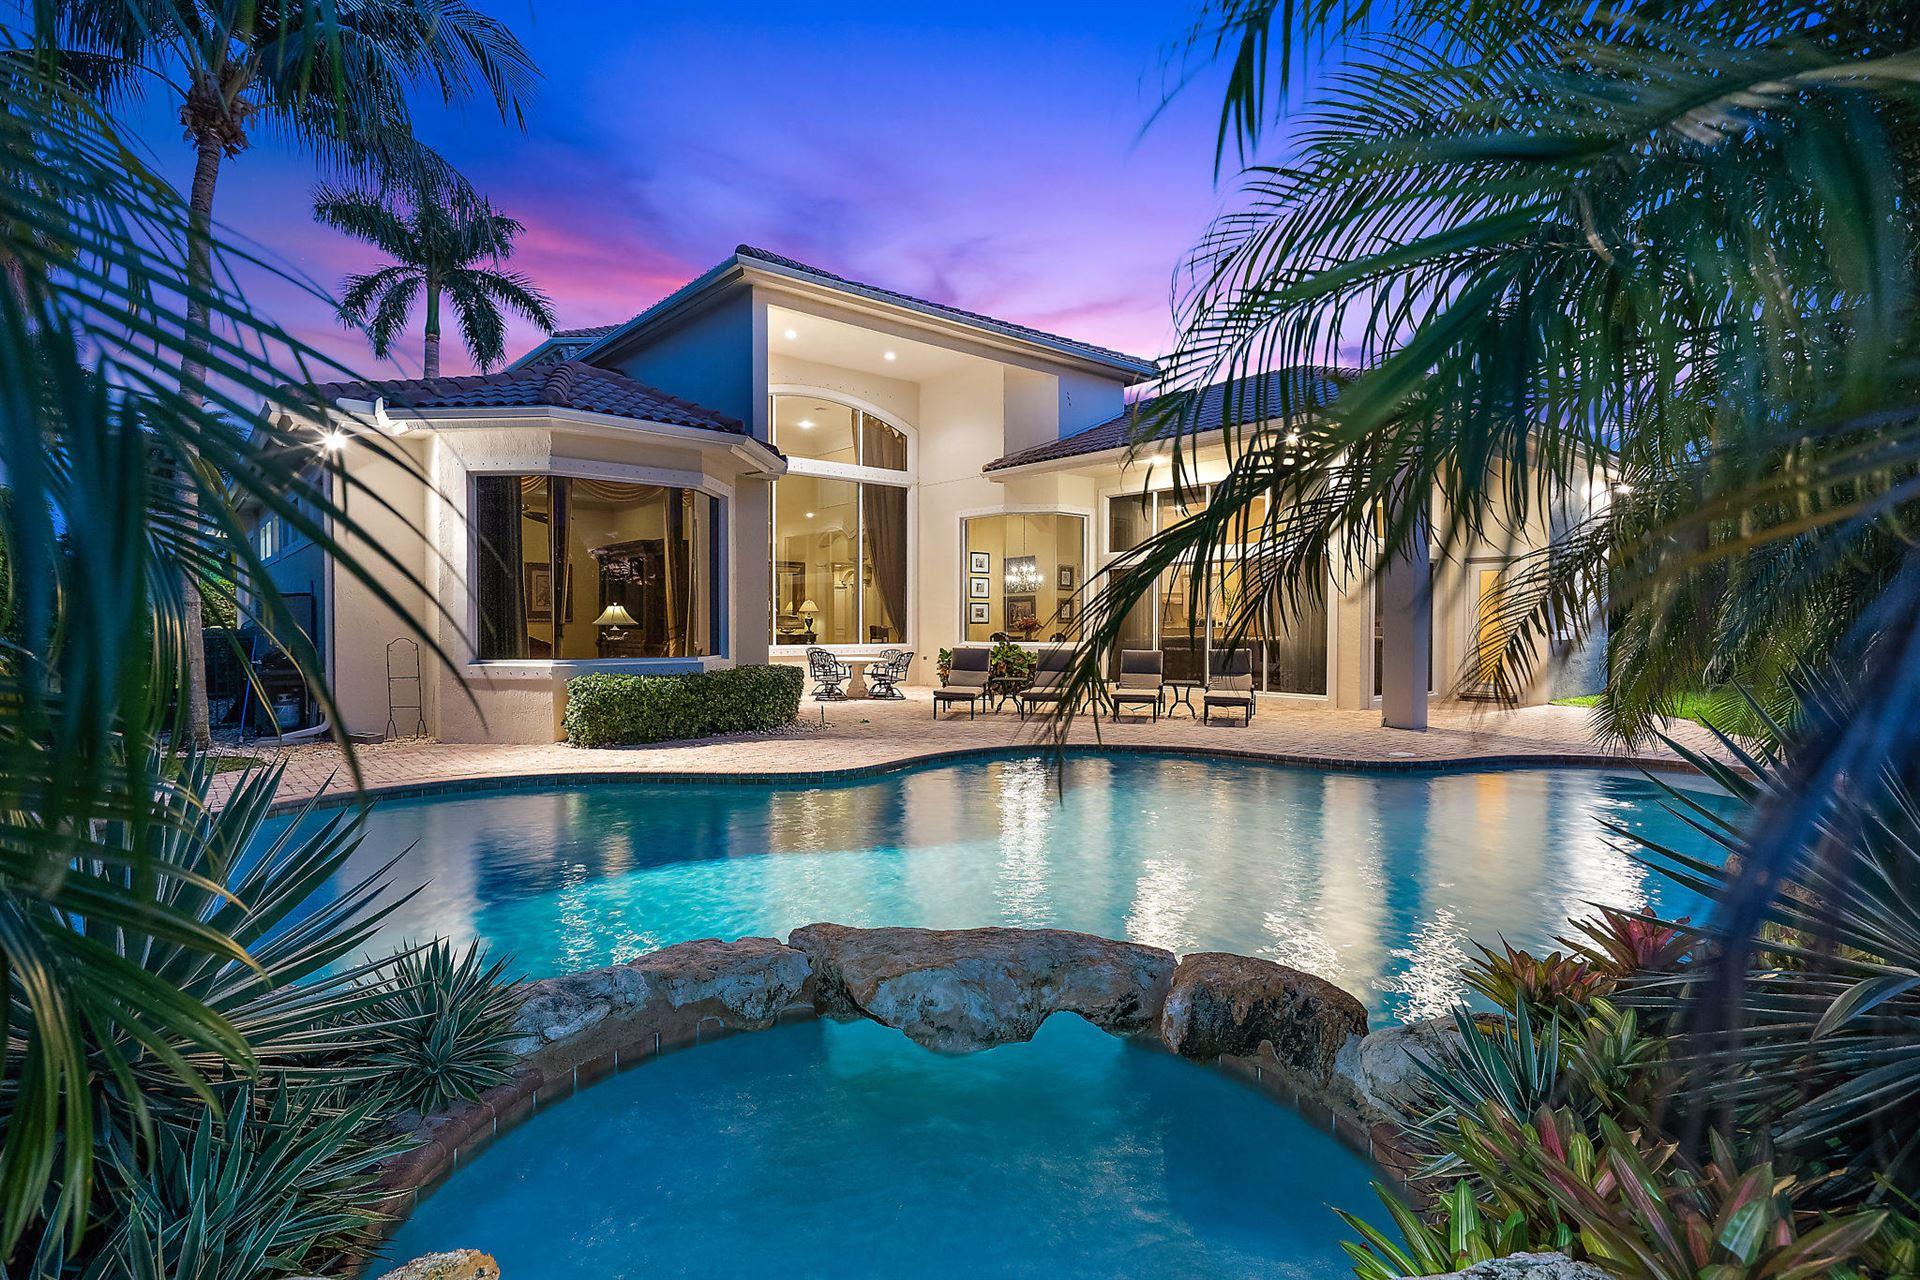 Photo of 423 Savoie Drive, Palm Beach Gardens, FL 33410 (MLS # RX-10650905)